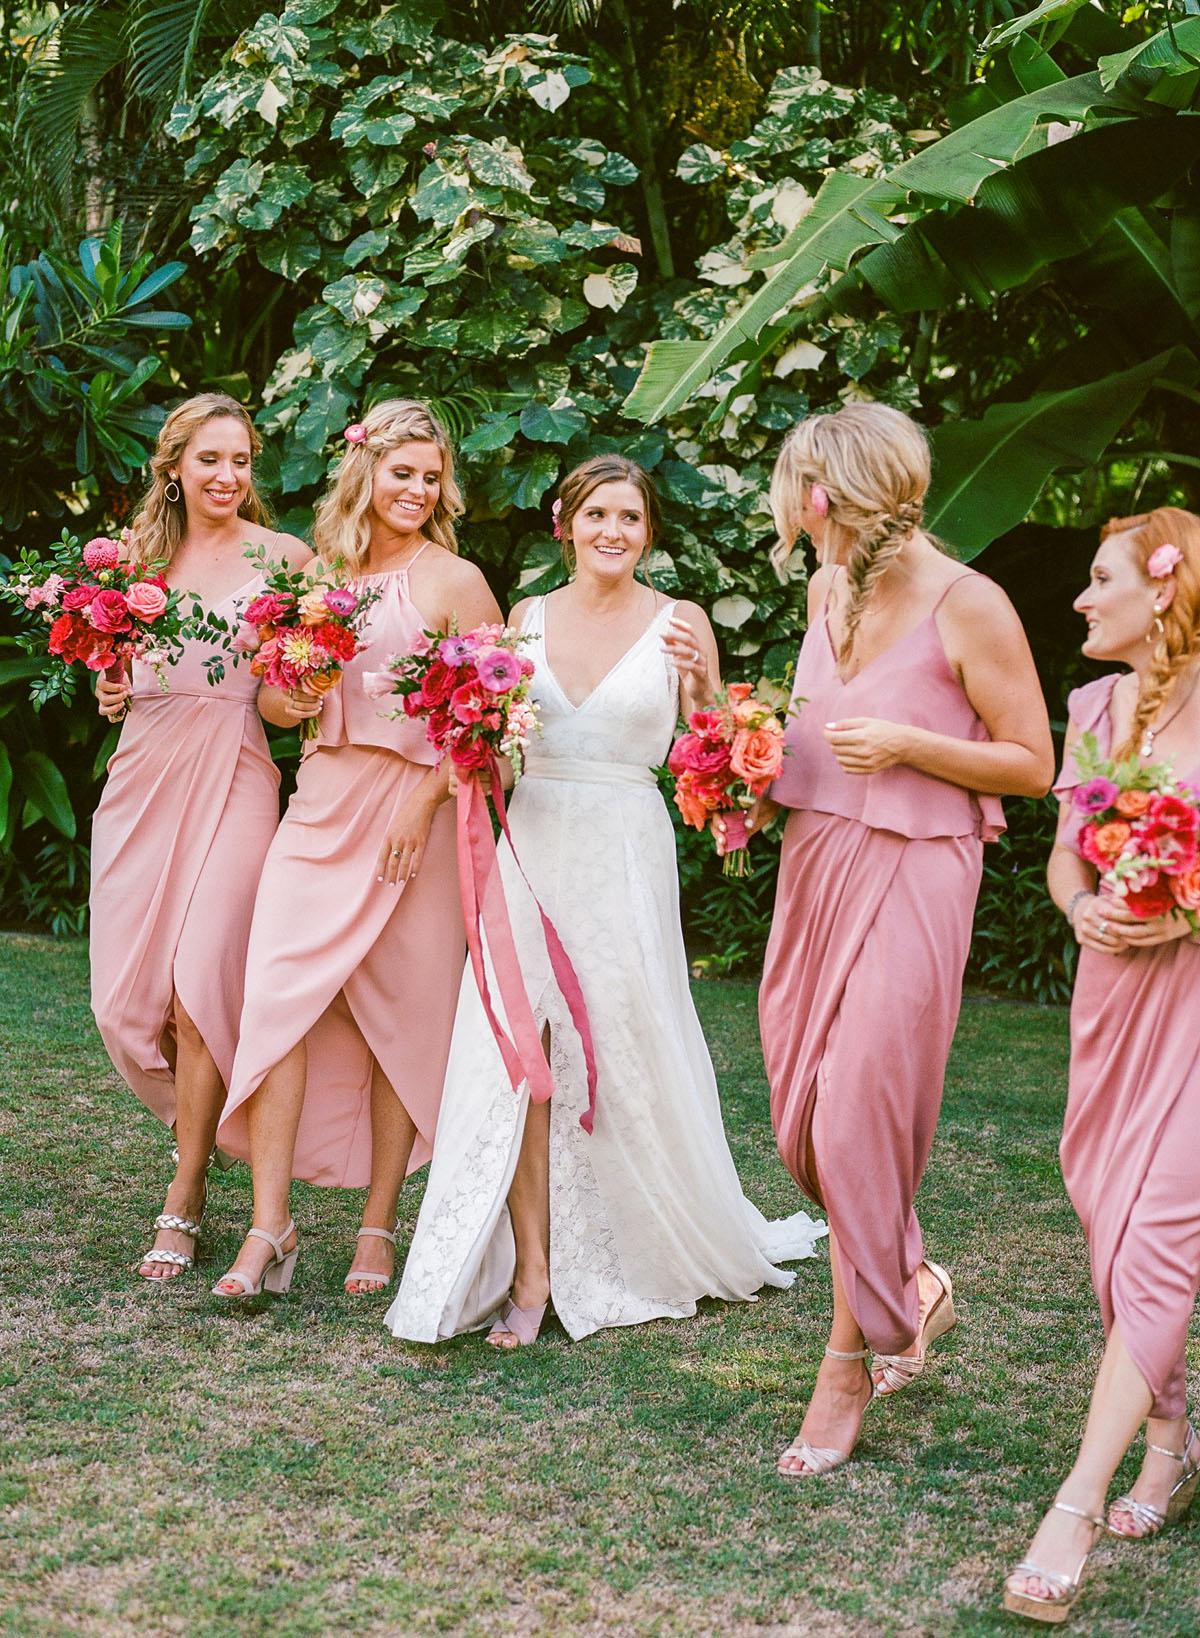 14-pink-bridesmaid-dresses.jpg